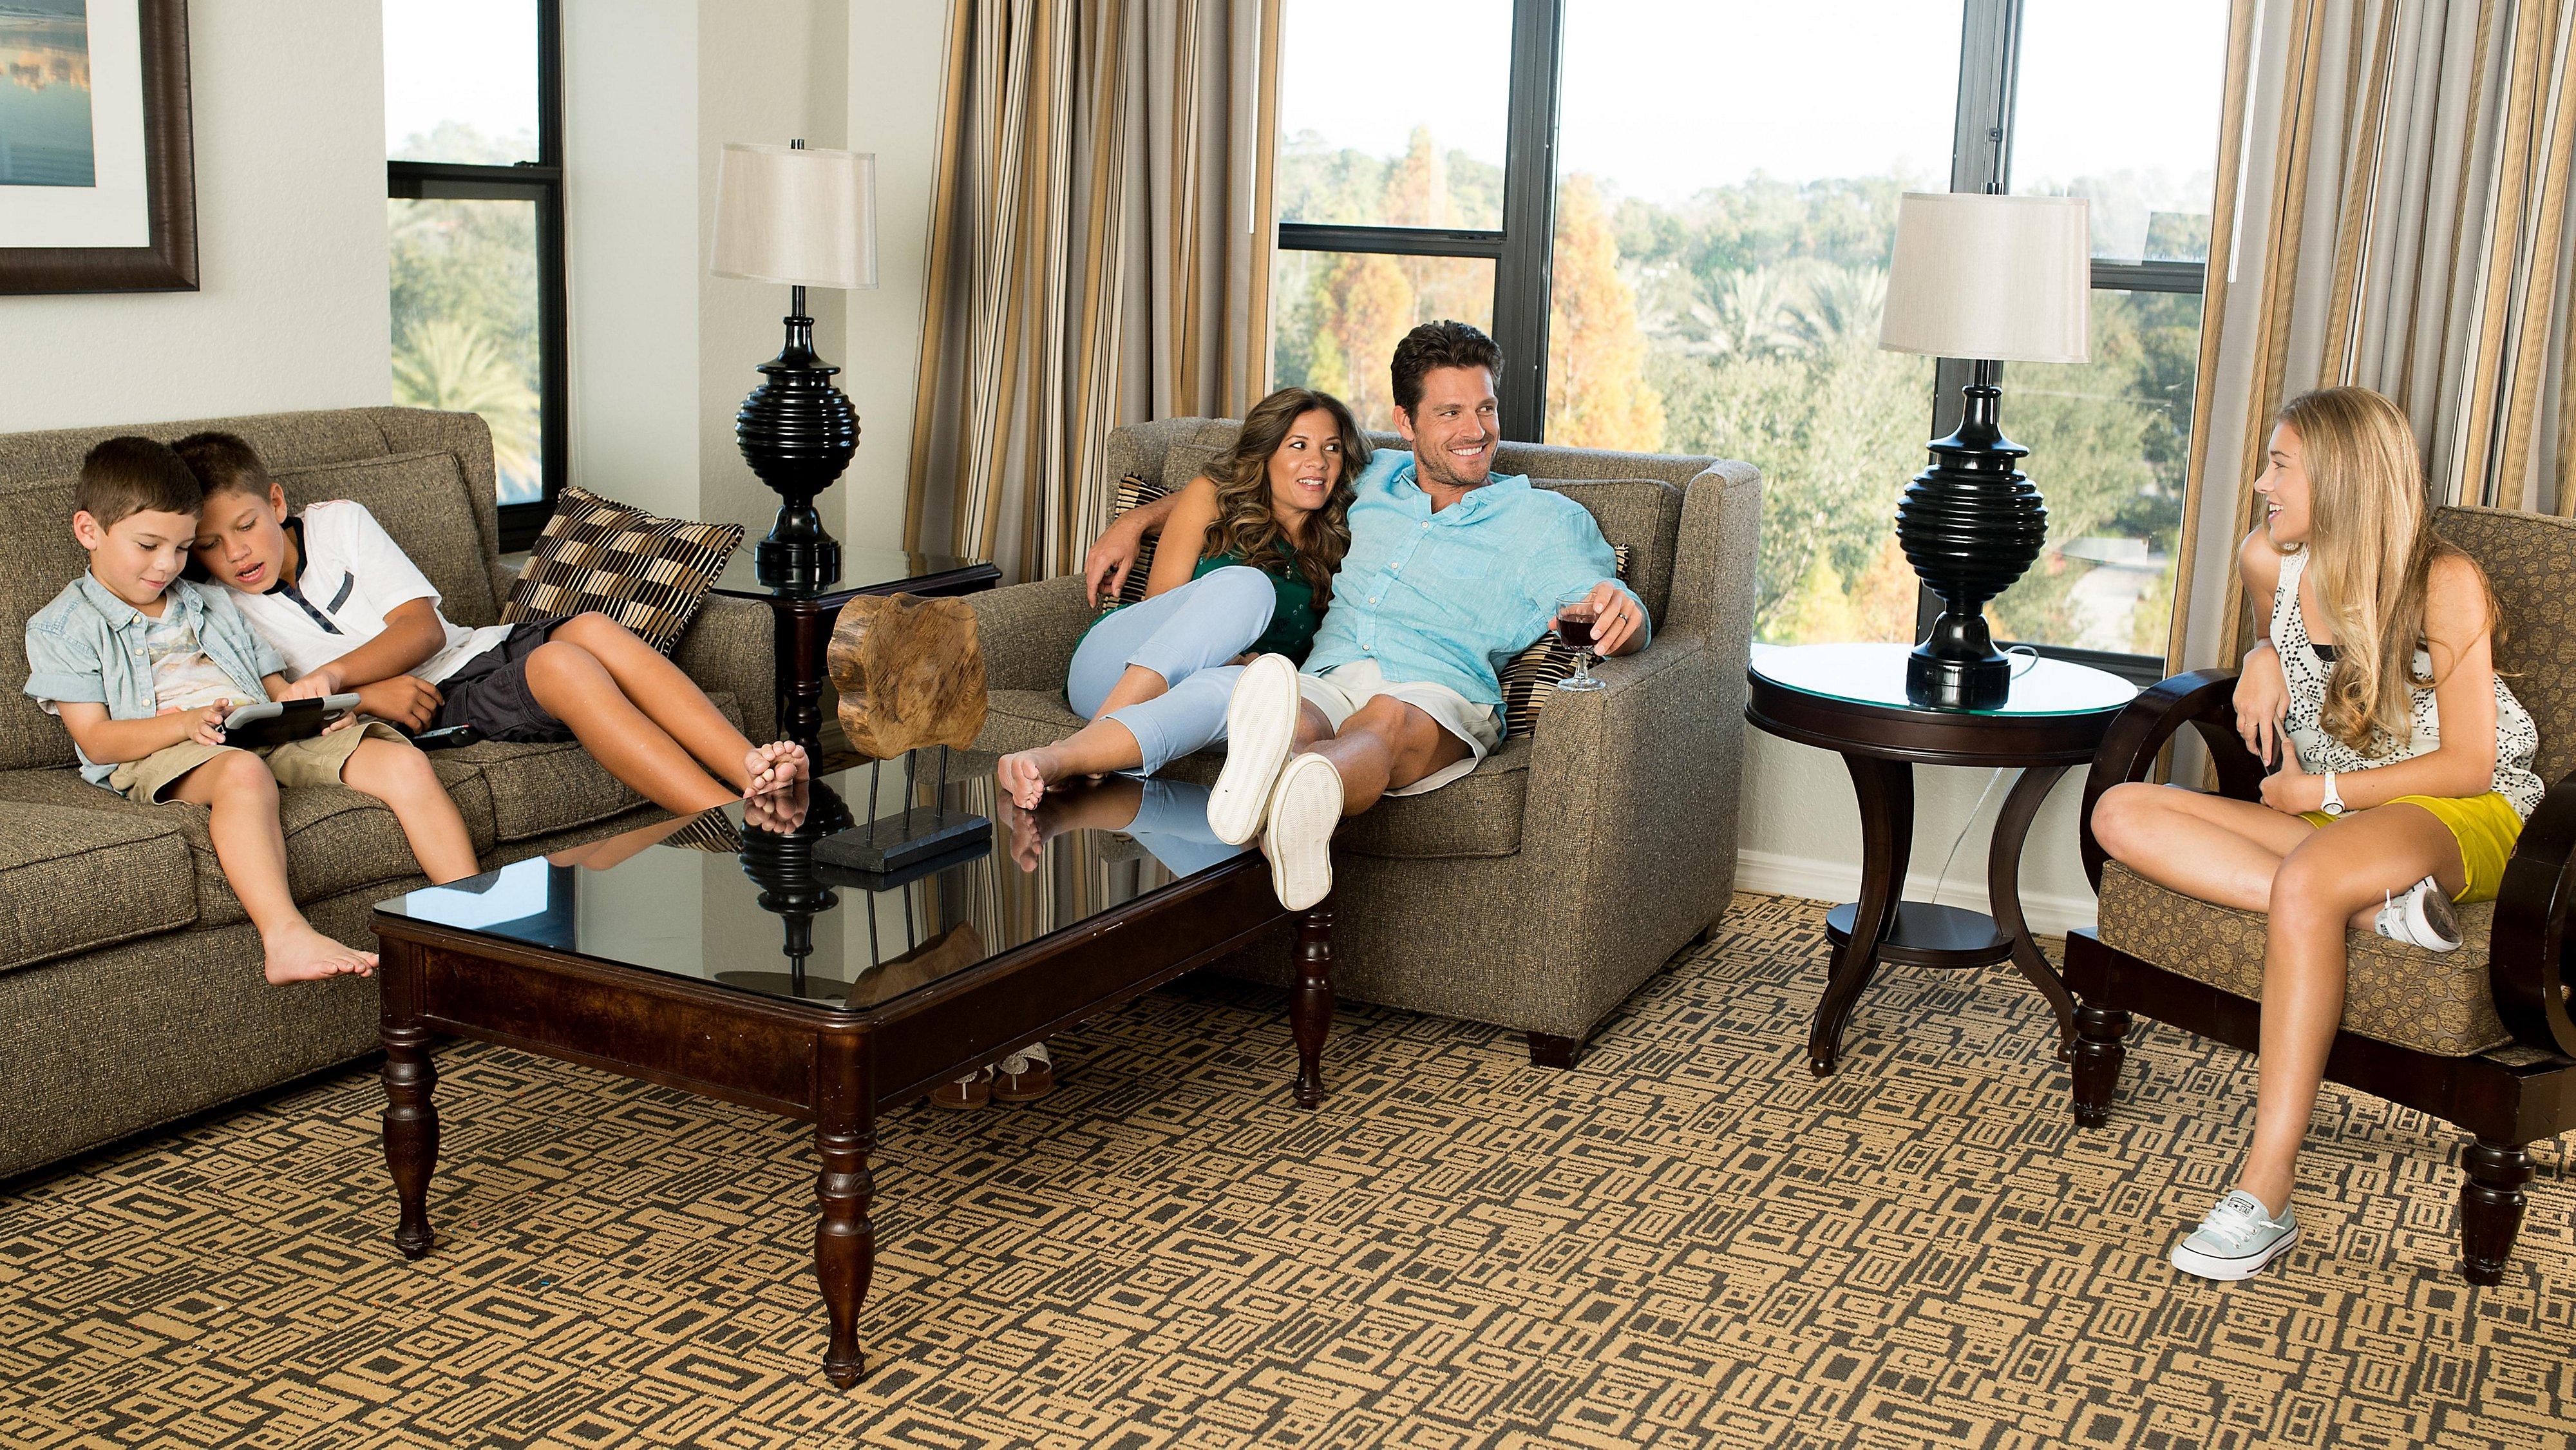 Orlando Hotels With Pools Near Kissimmee, FL | Holiday Inn Club ...